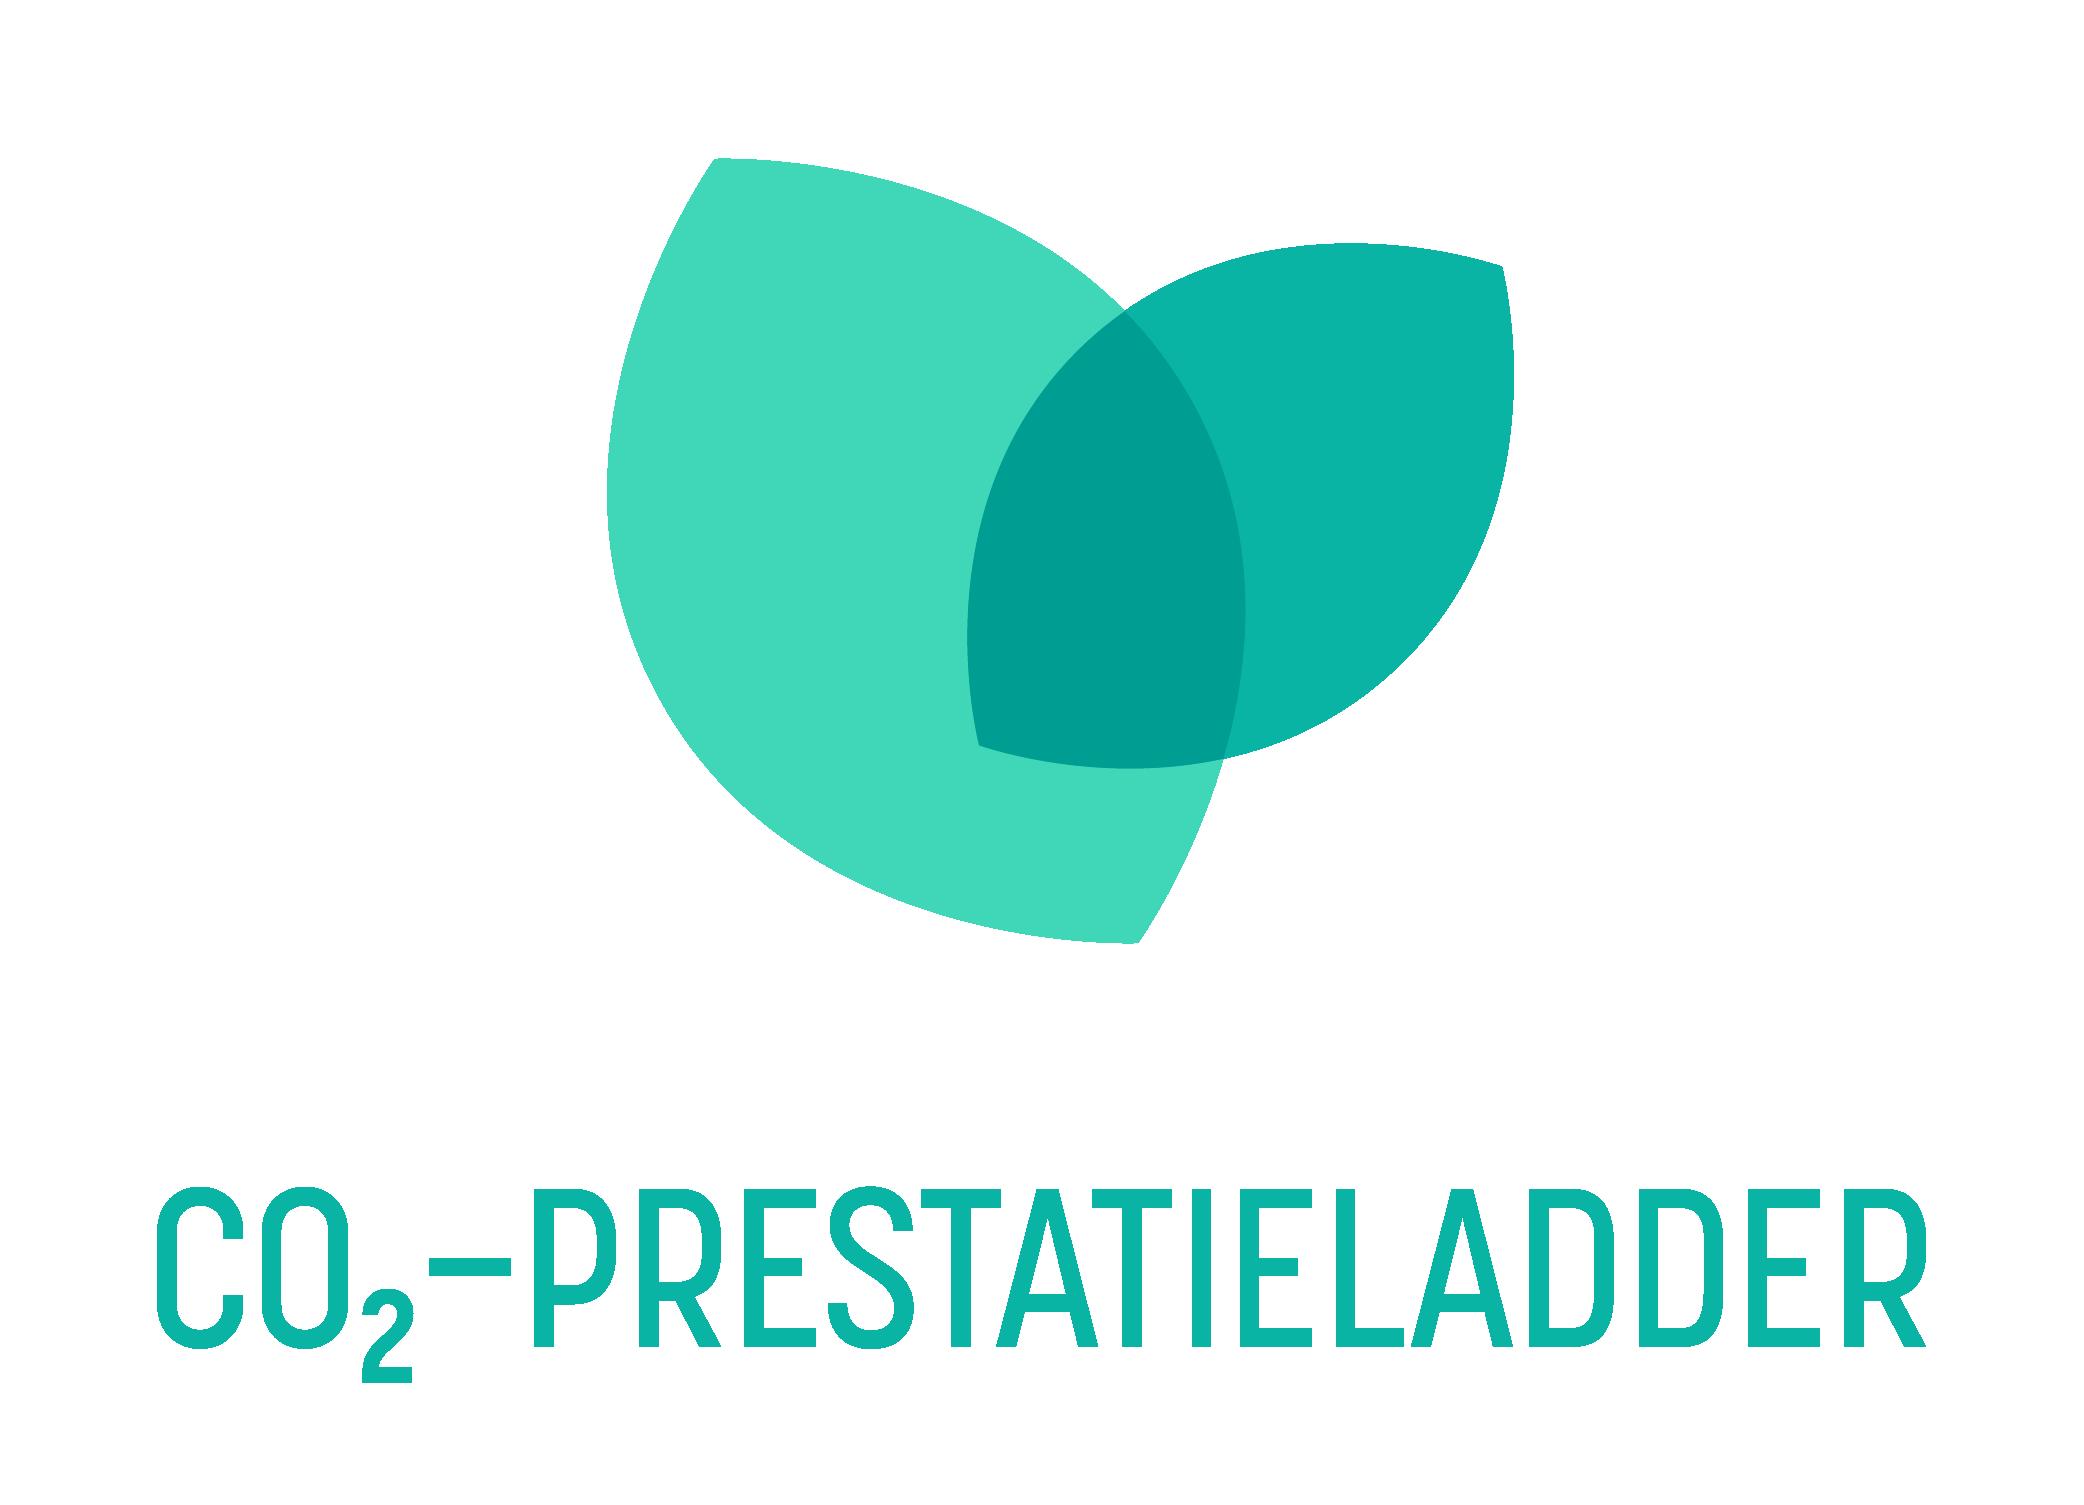 logo co2-prestatieladder